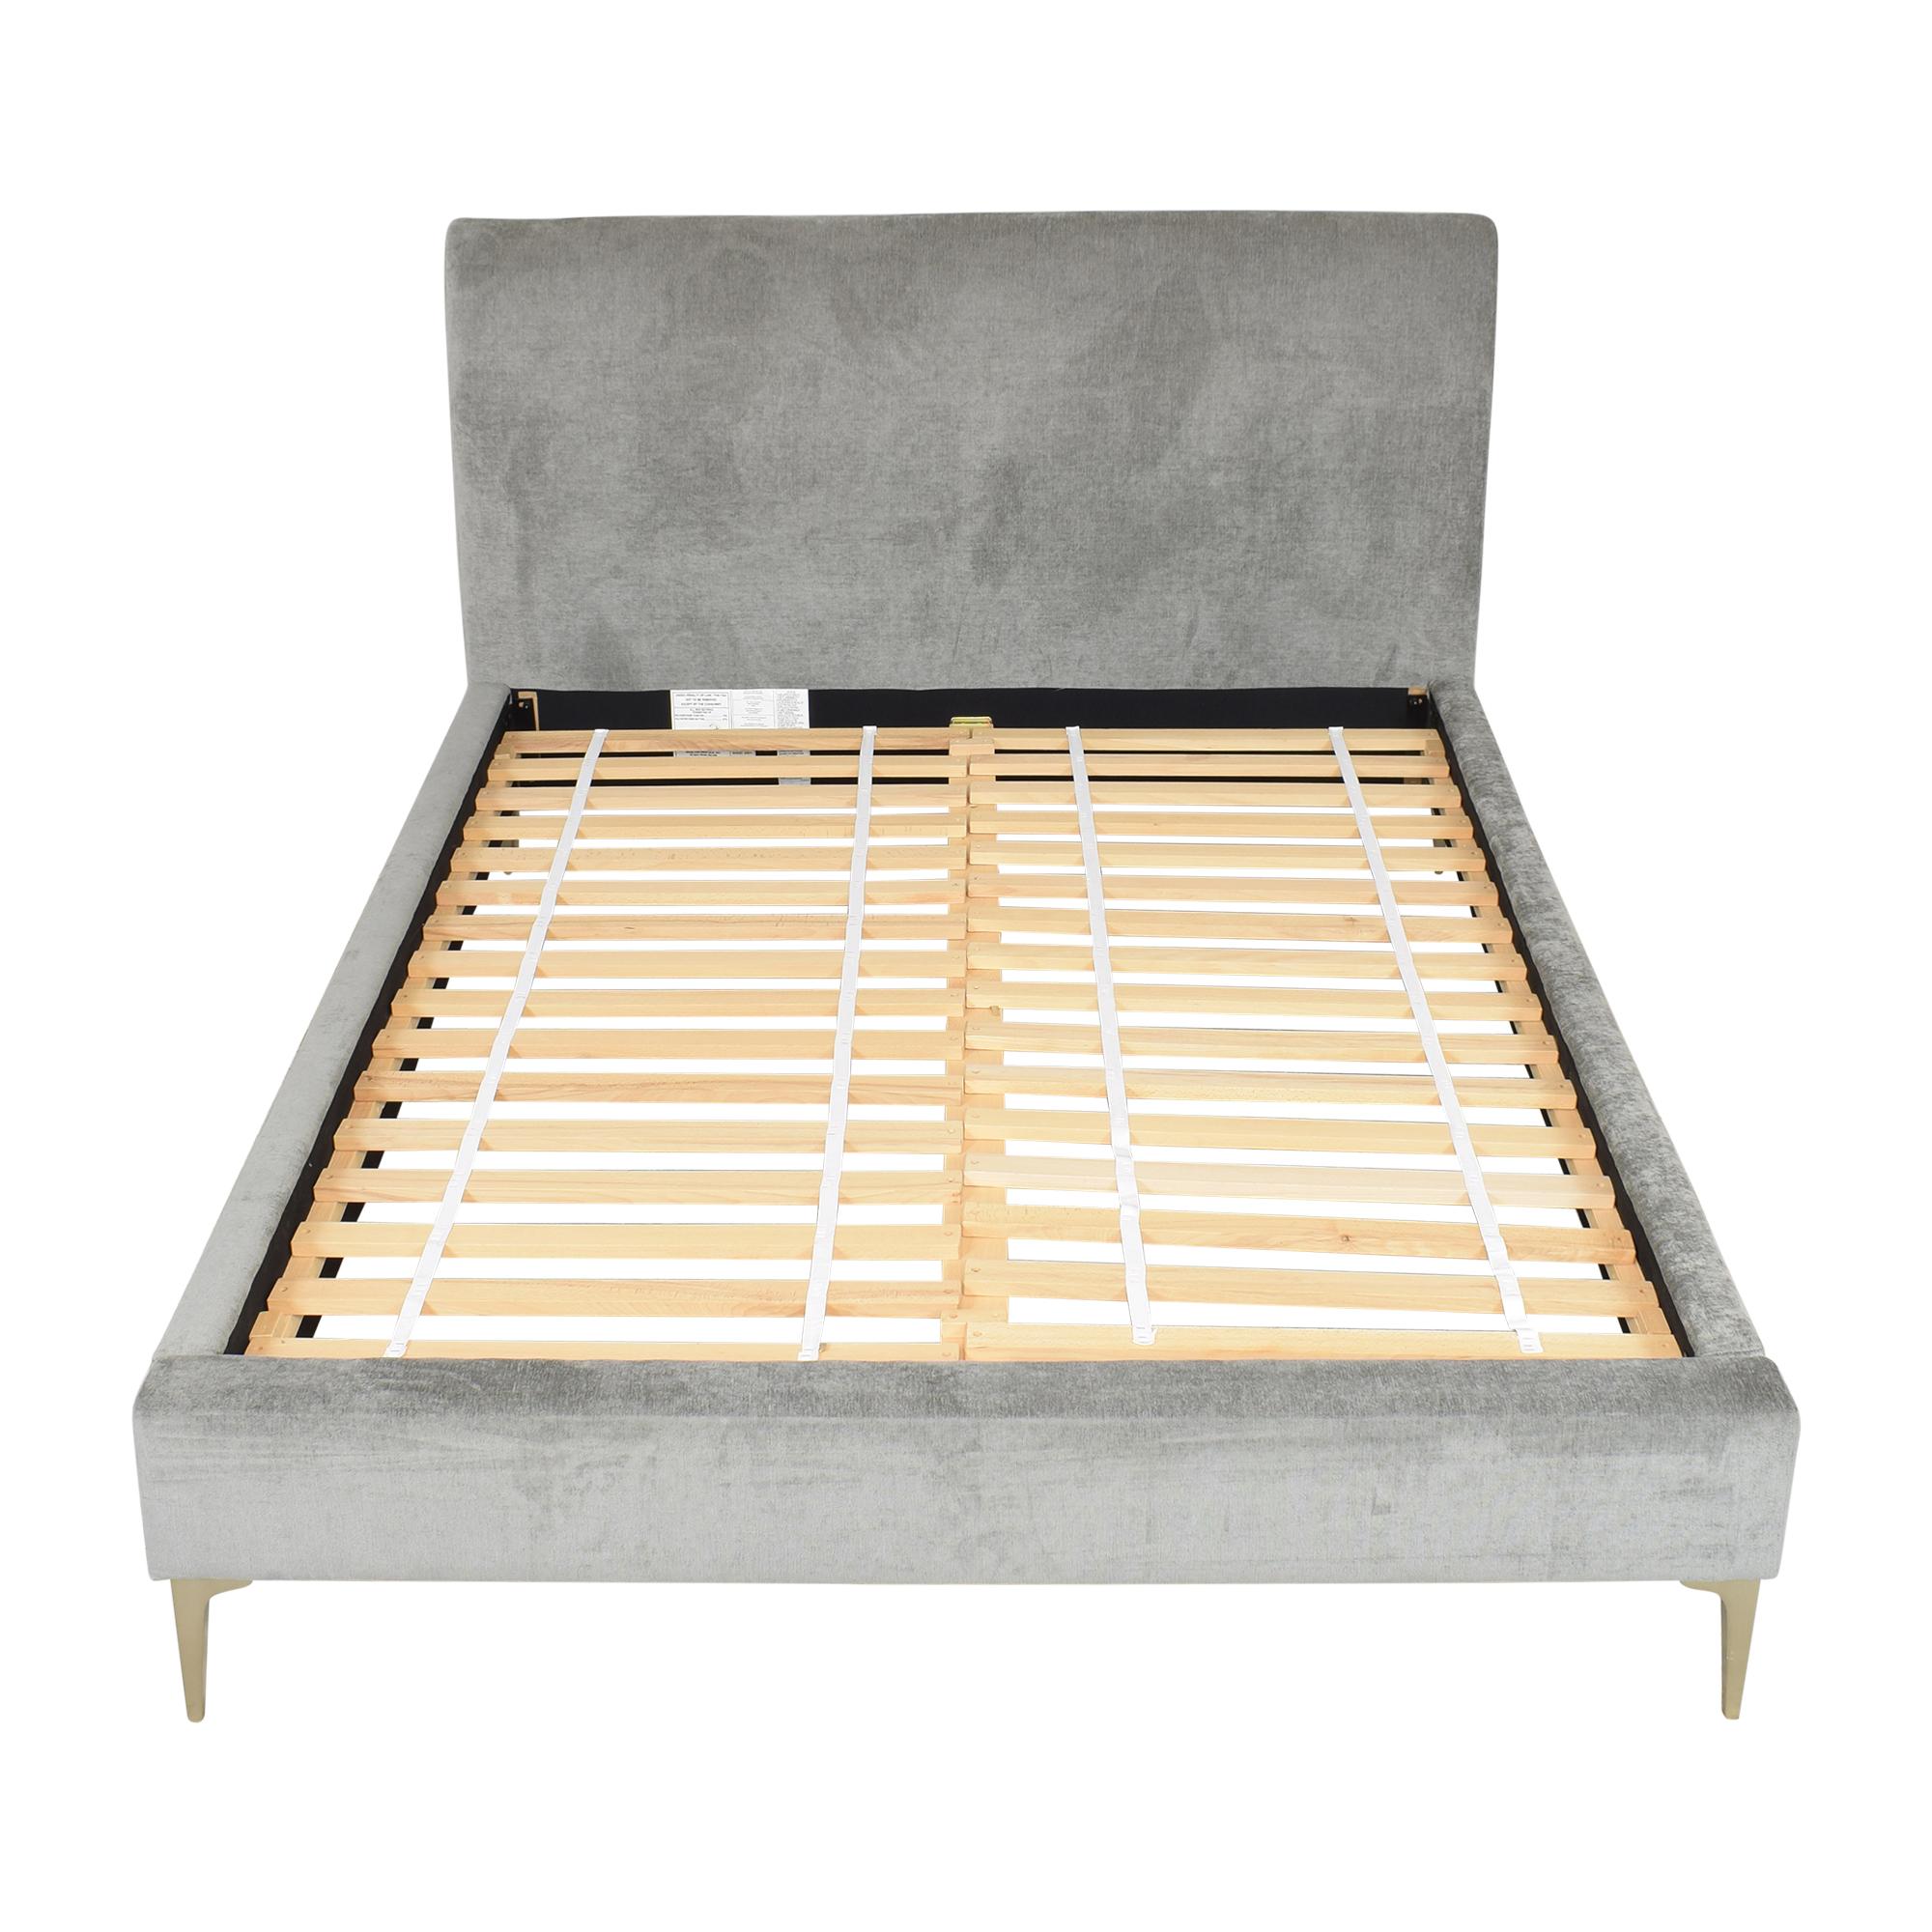 West Elm West Elm Andes Deco Upholstered Queen Bed for sale